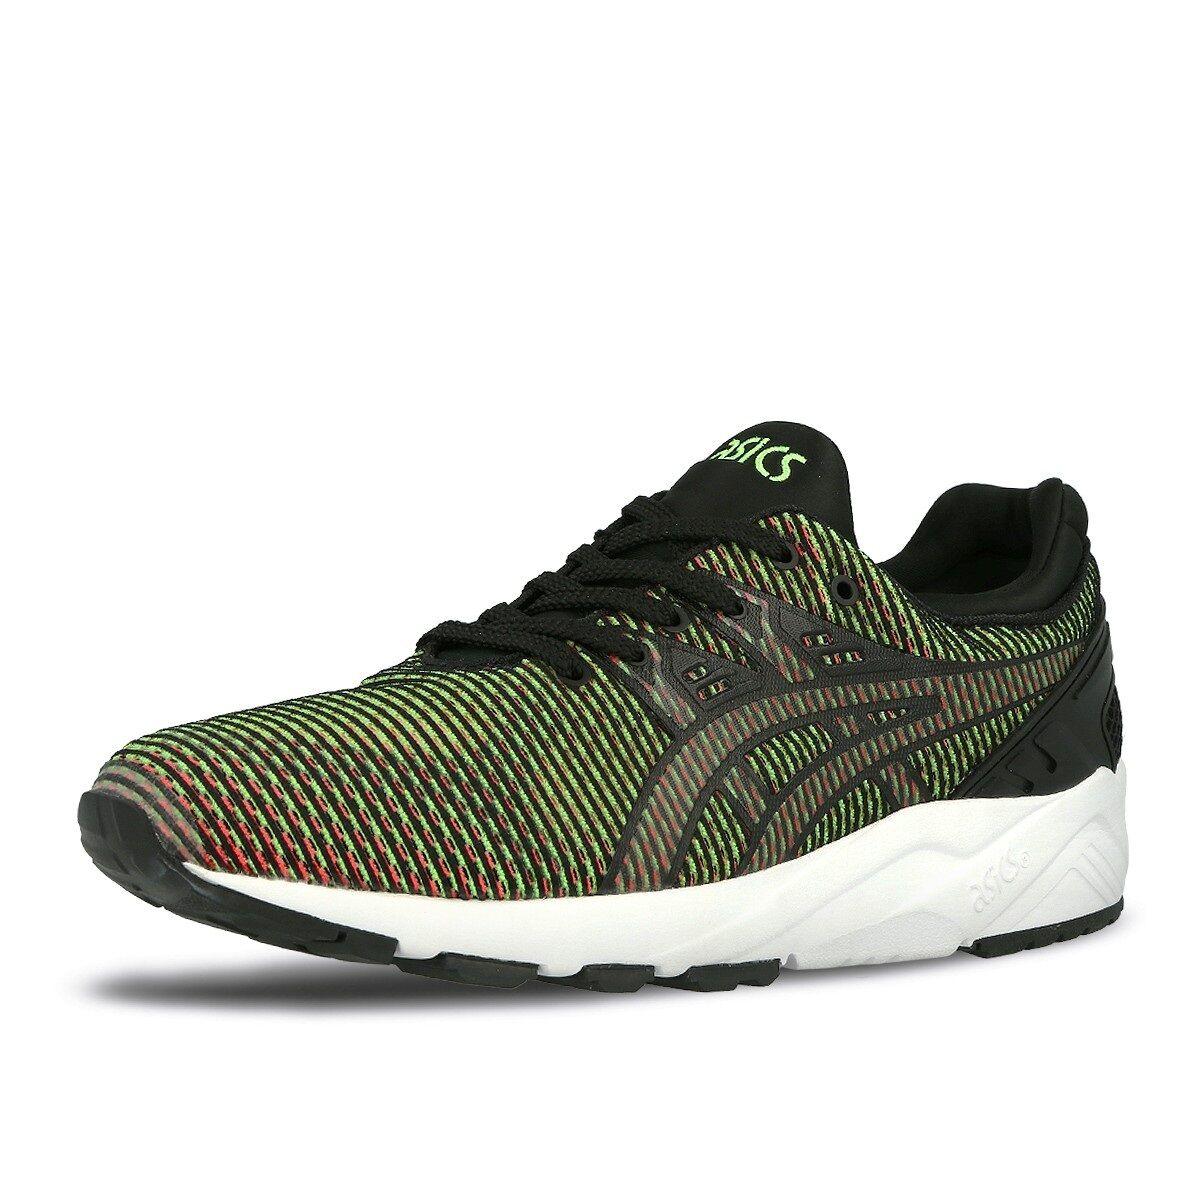 Schuhe triner asic onitsuka tigre gel kayano triner Schuhe evo chamaleoid maglie packung 40151e